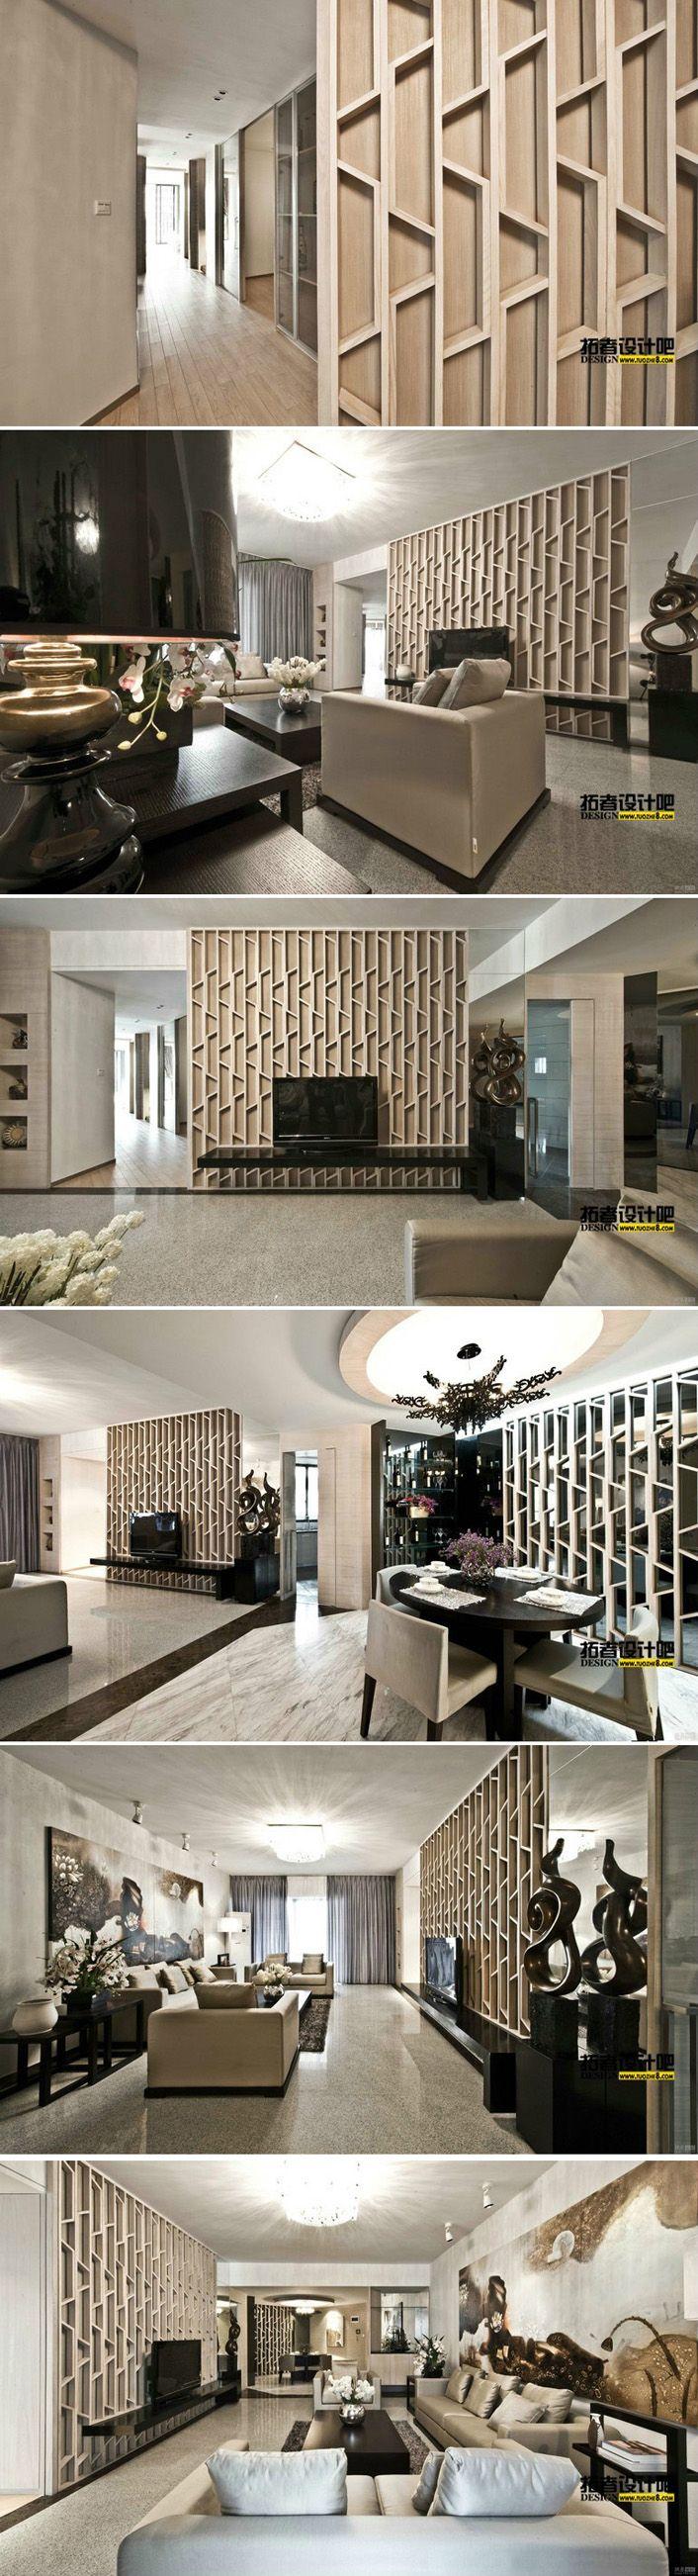 Modern_Contemporary_Interior_Design